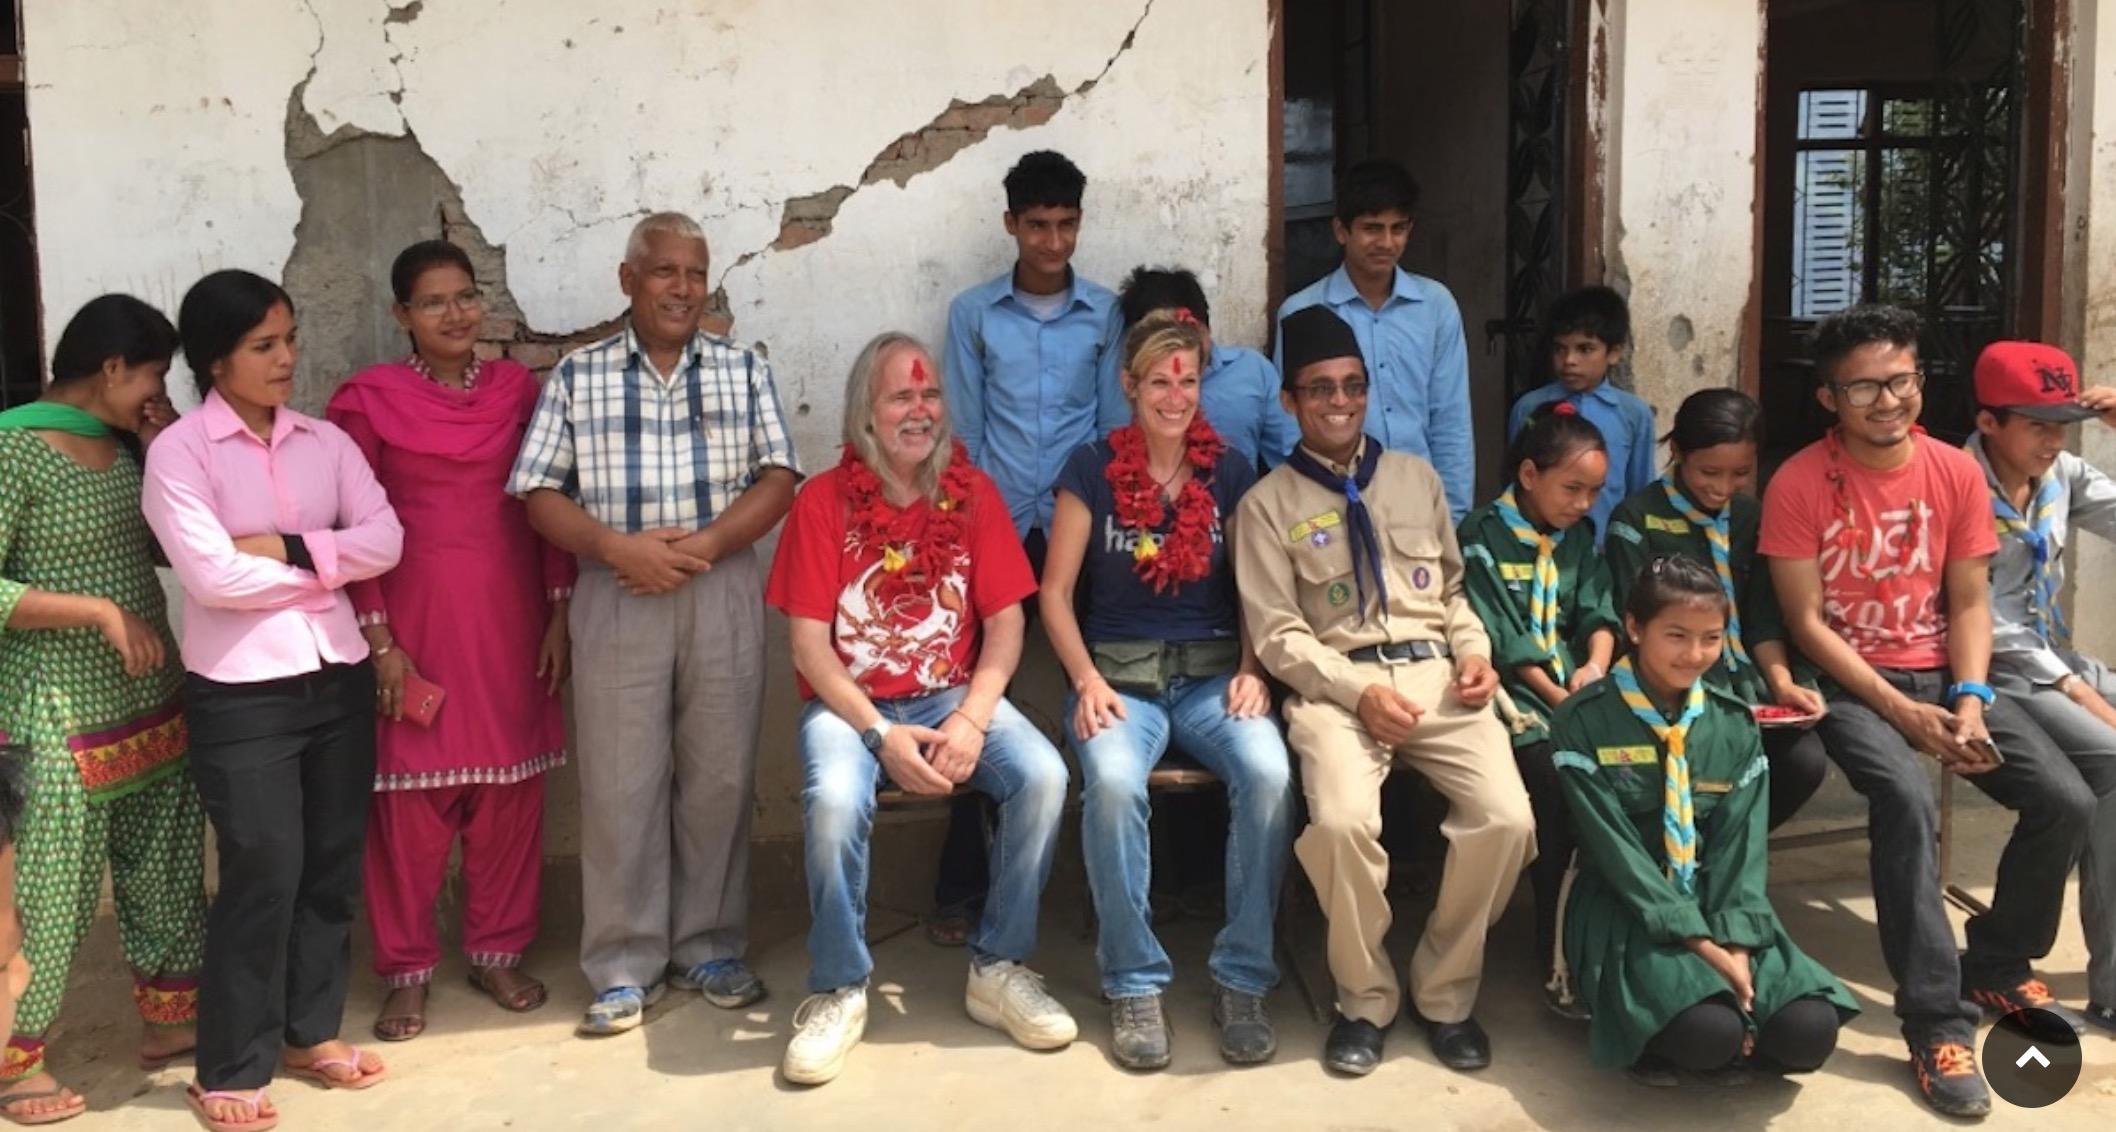 Moksha-Ayurveda-Nepal – Umzug und Neubau einer Ayurveda-Klinik in Nepal